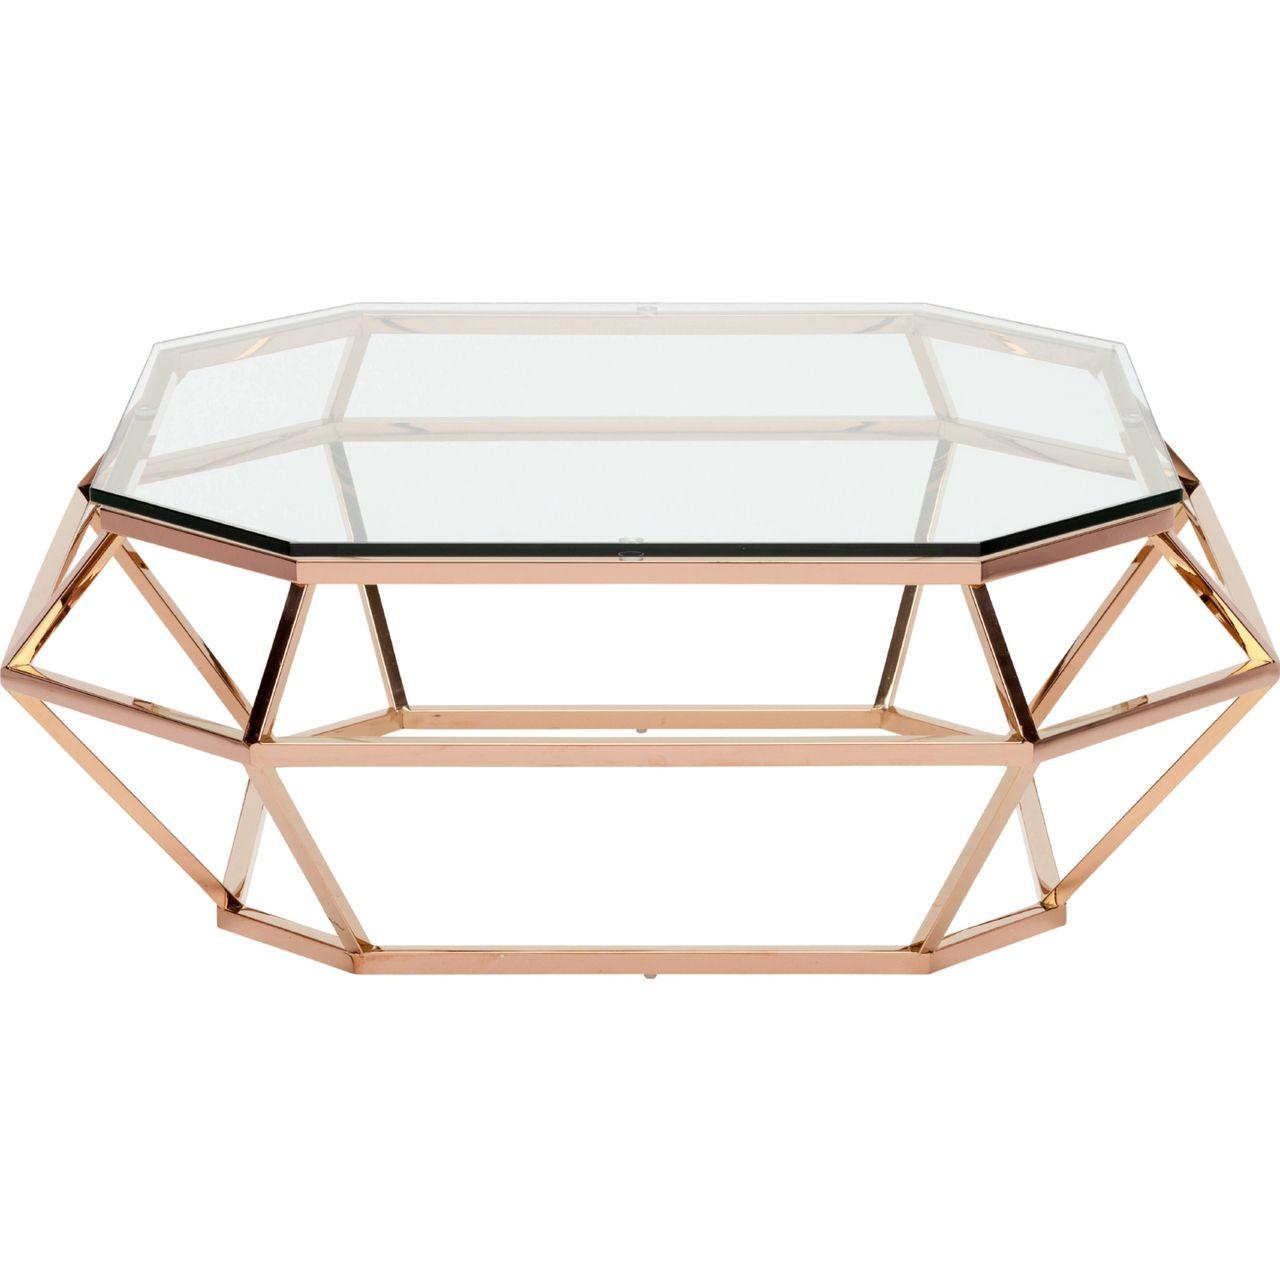 Diamond Square Coffee Table Coffee Table Coffee Table Square Rose Gold Coffee Table [ 1280 x 1280 Pixel ]